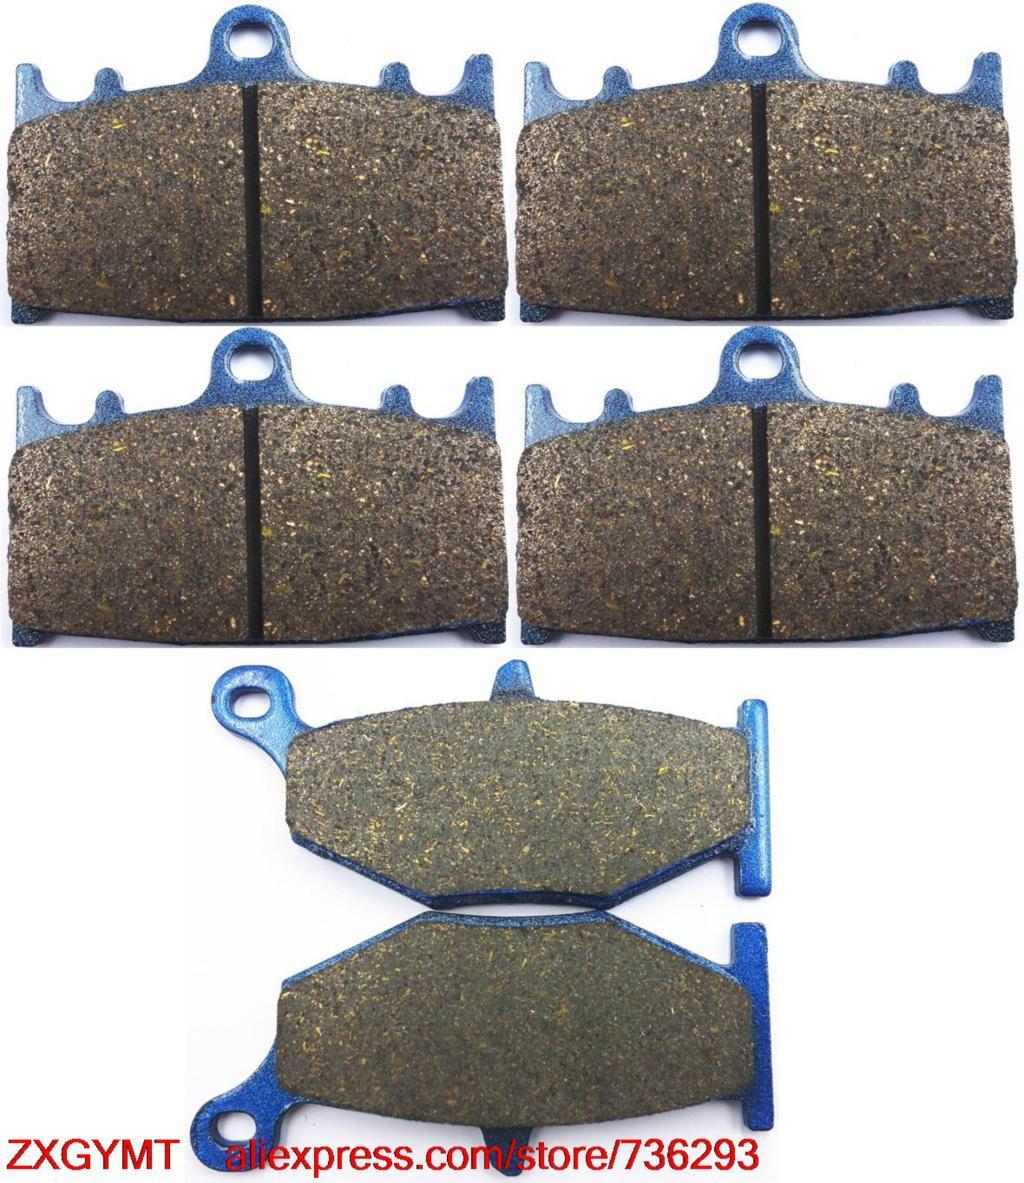 цена на Motorcycle Semi-Metallic Brake Pad Set for SUZUKI GSR600 GSR 600 2006 & up